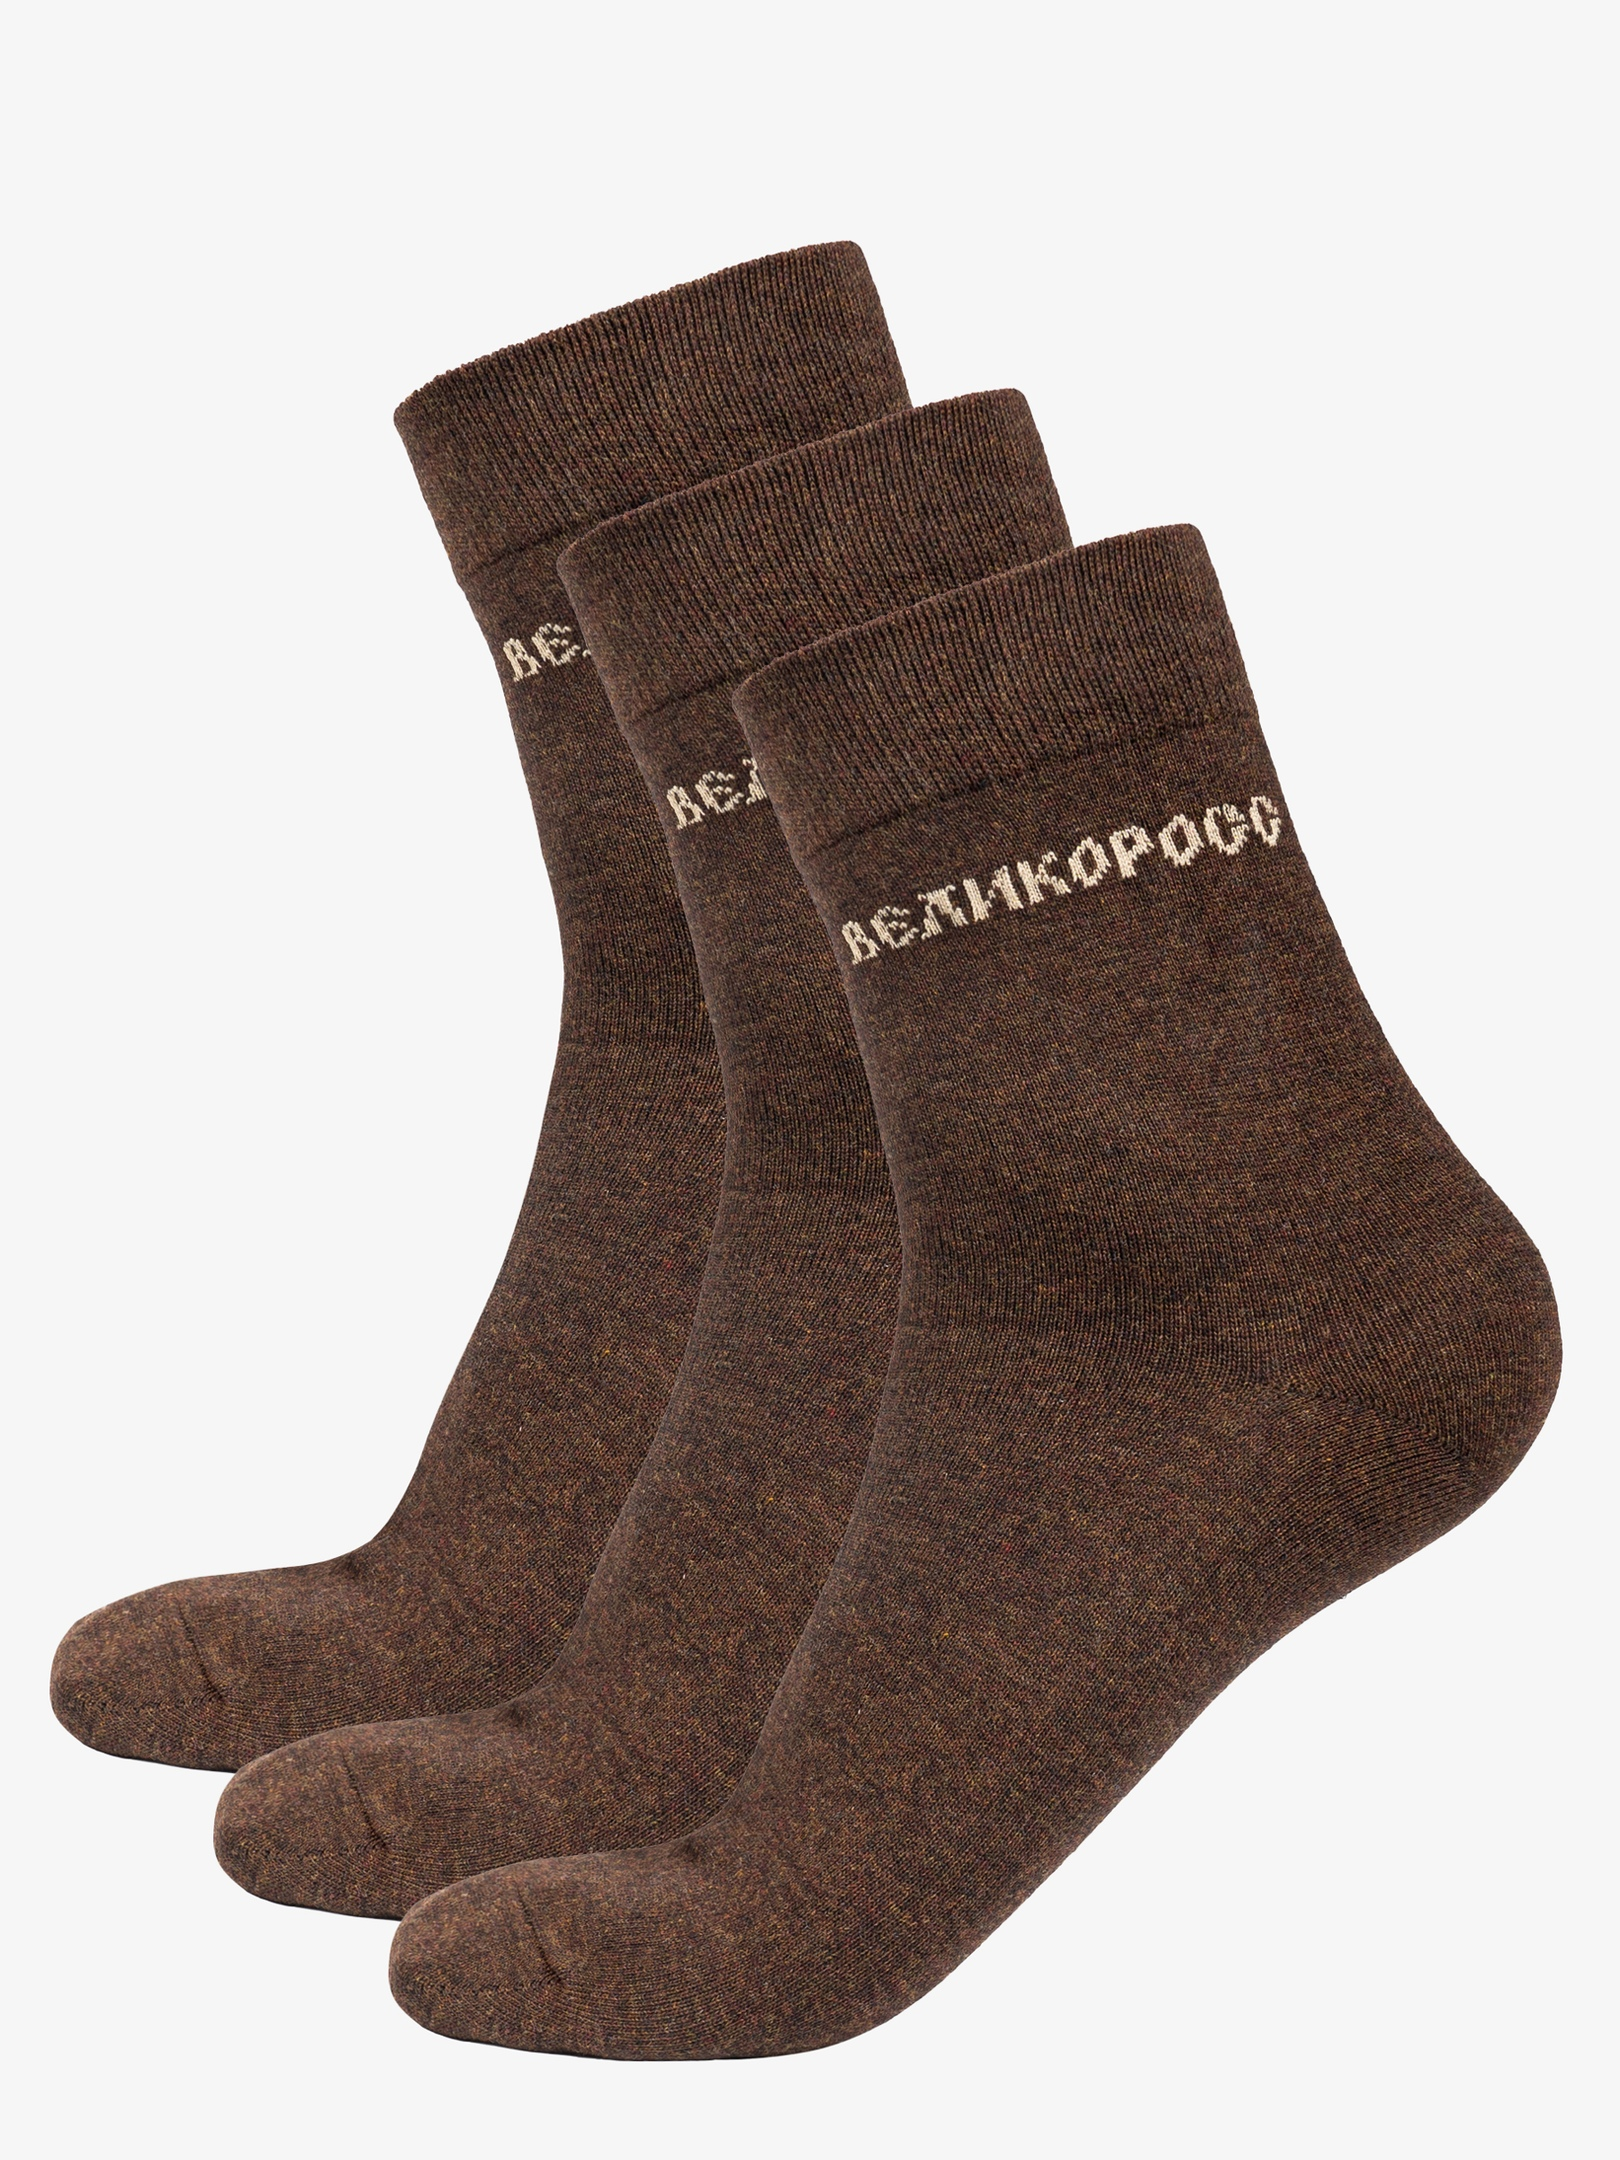 Носки унисекс Великоросс NN35611 коричневый 25